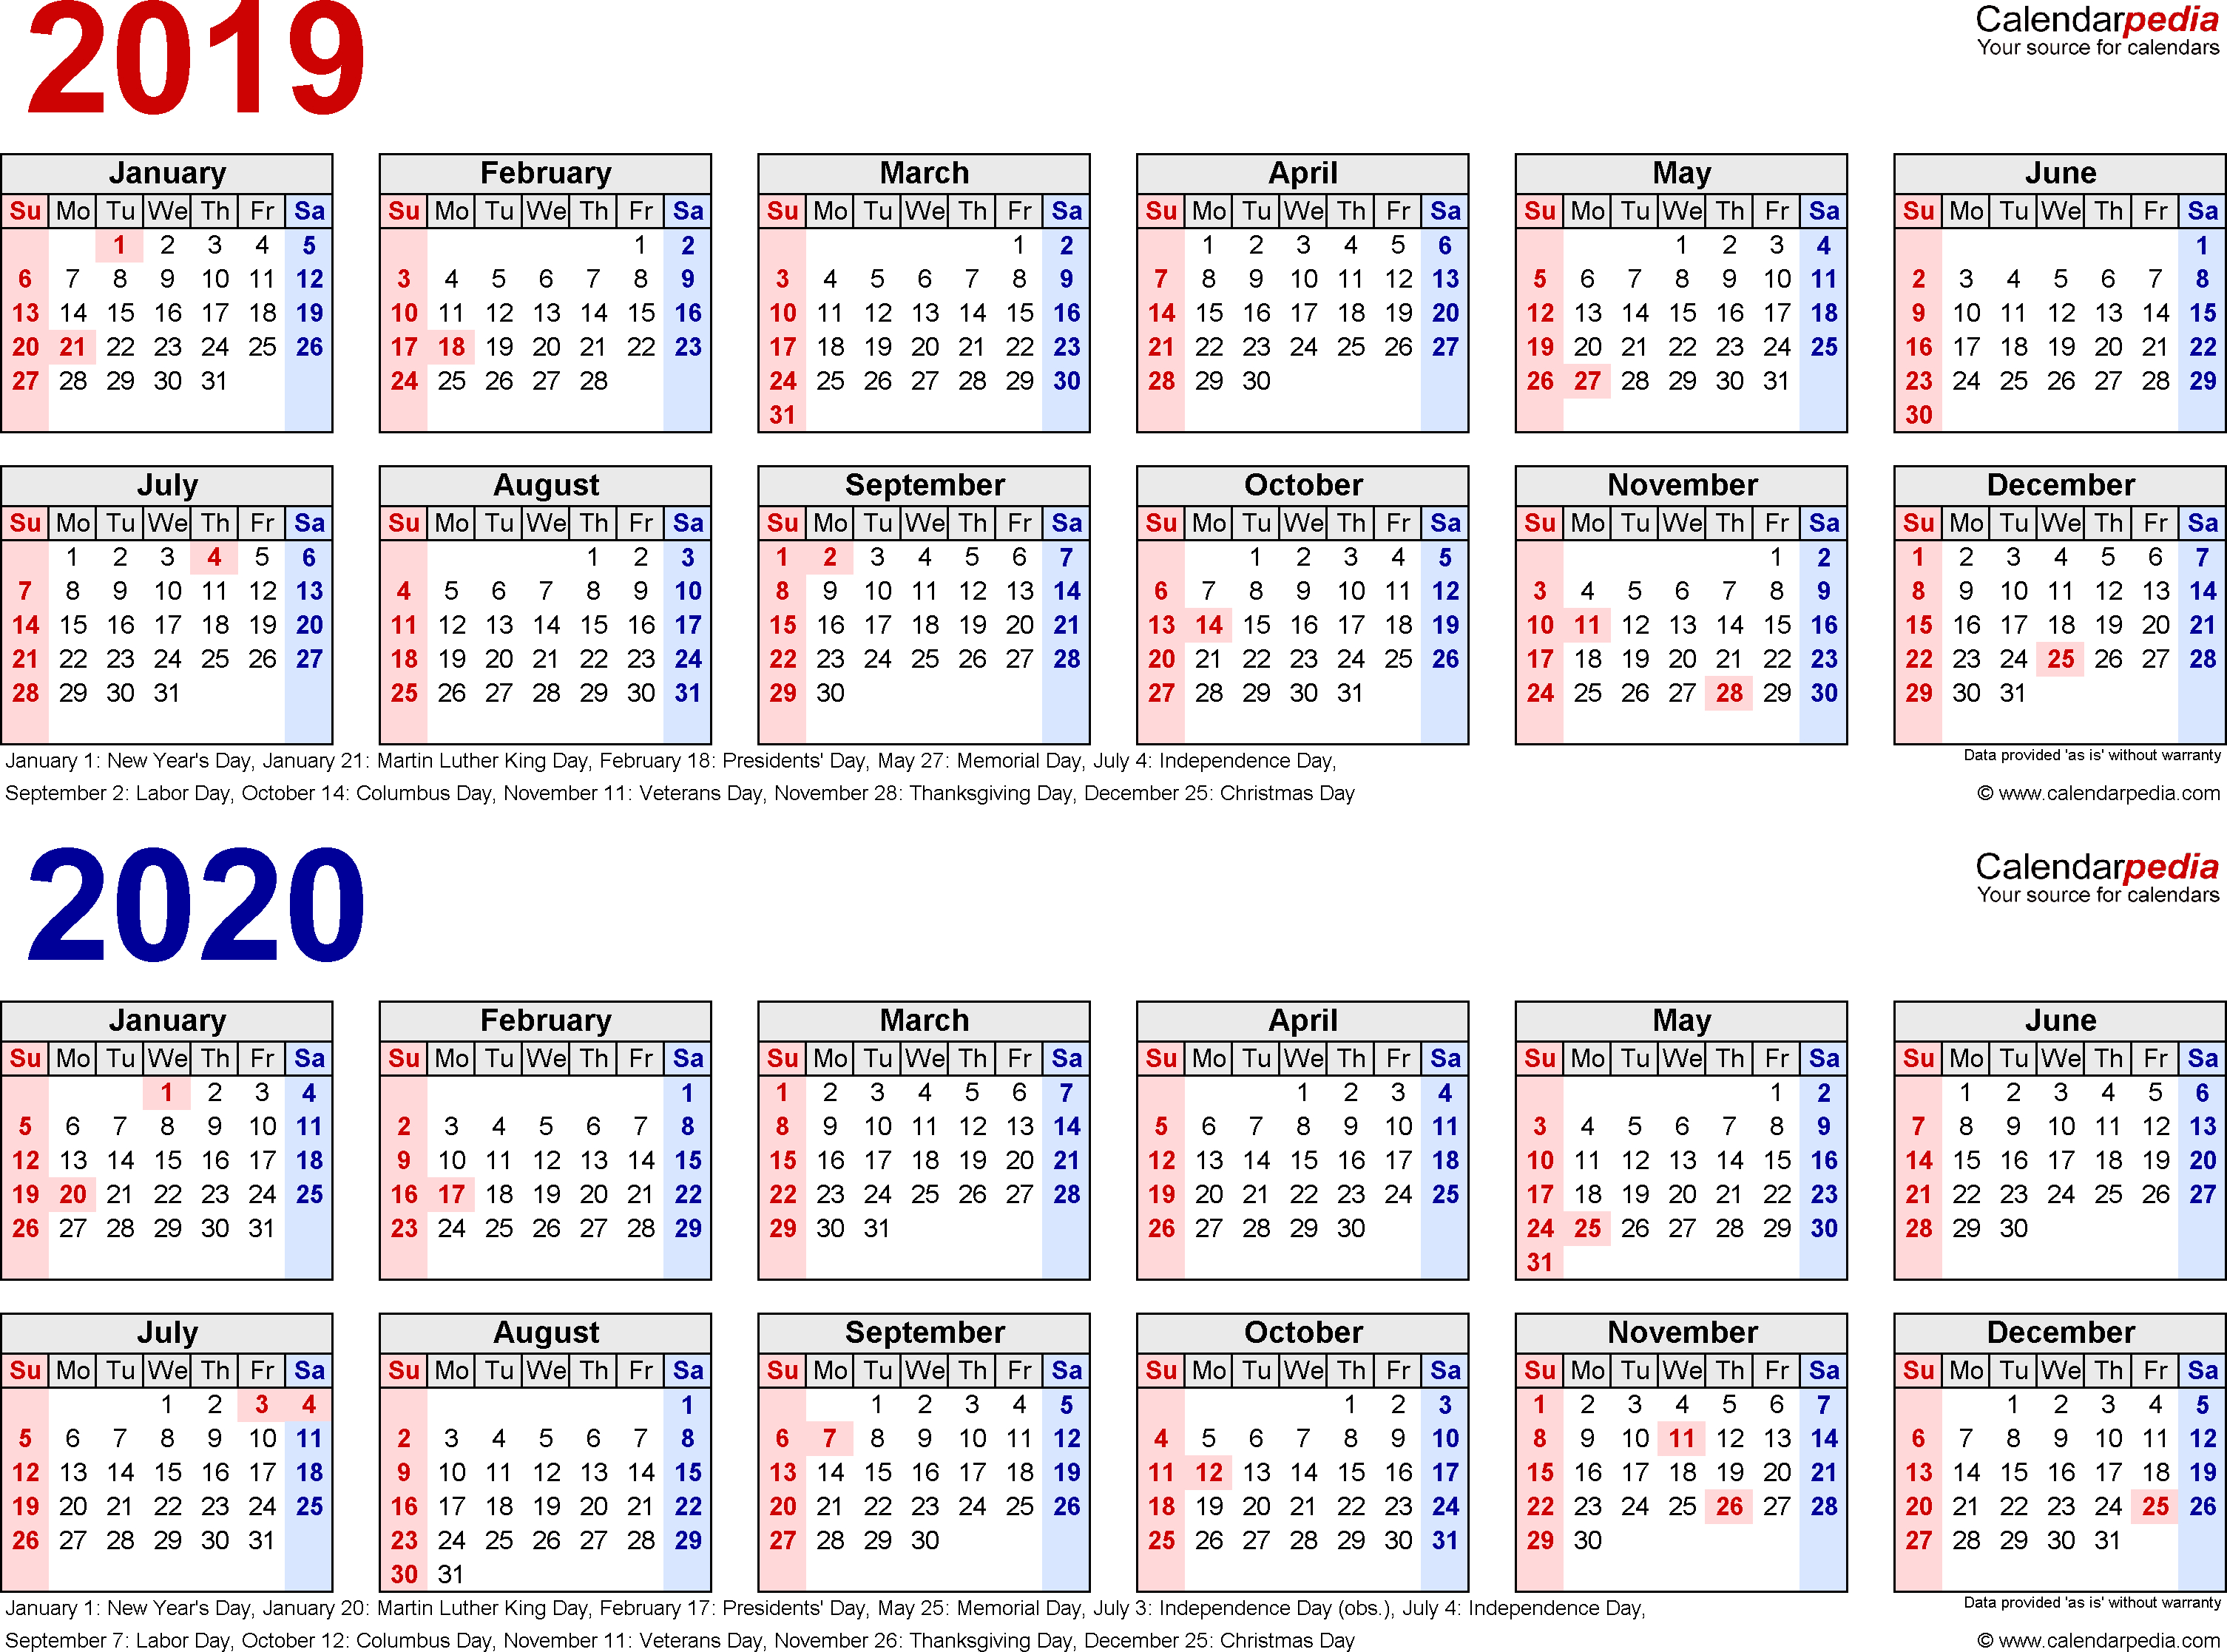 2019-2020 Calendar - Free Printable Two-Year Pdf Calendars for Fiscal Calendar 2019/2020 Free Printable